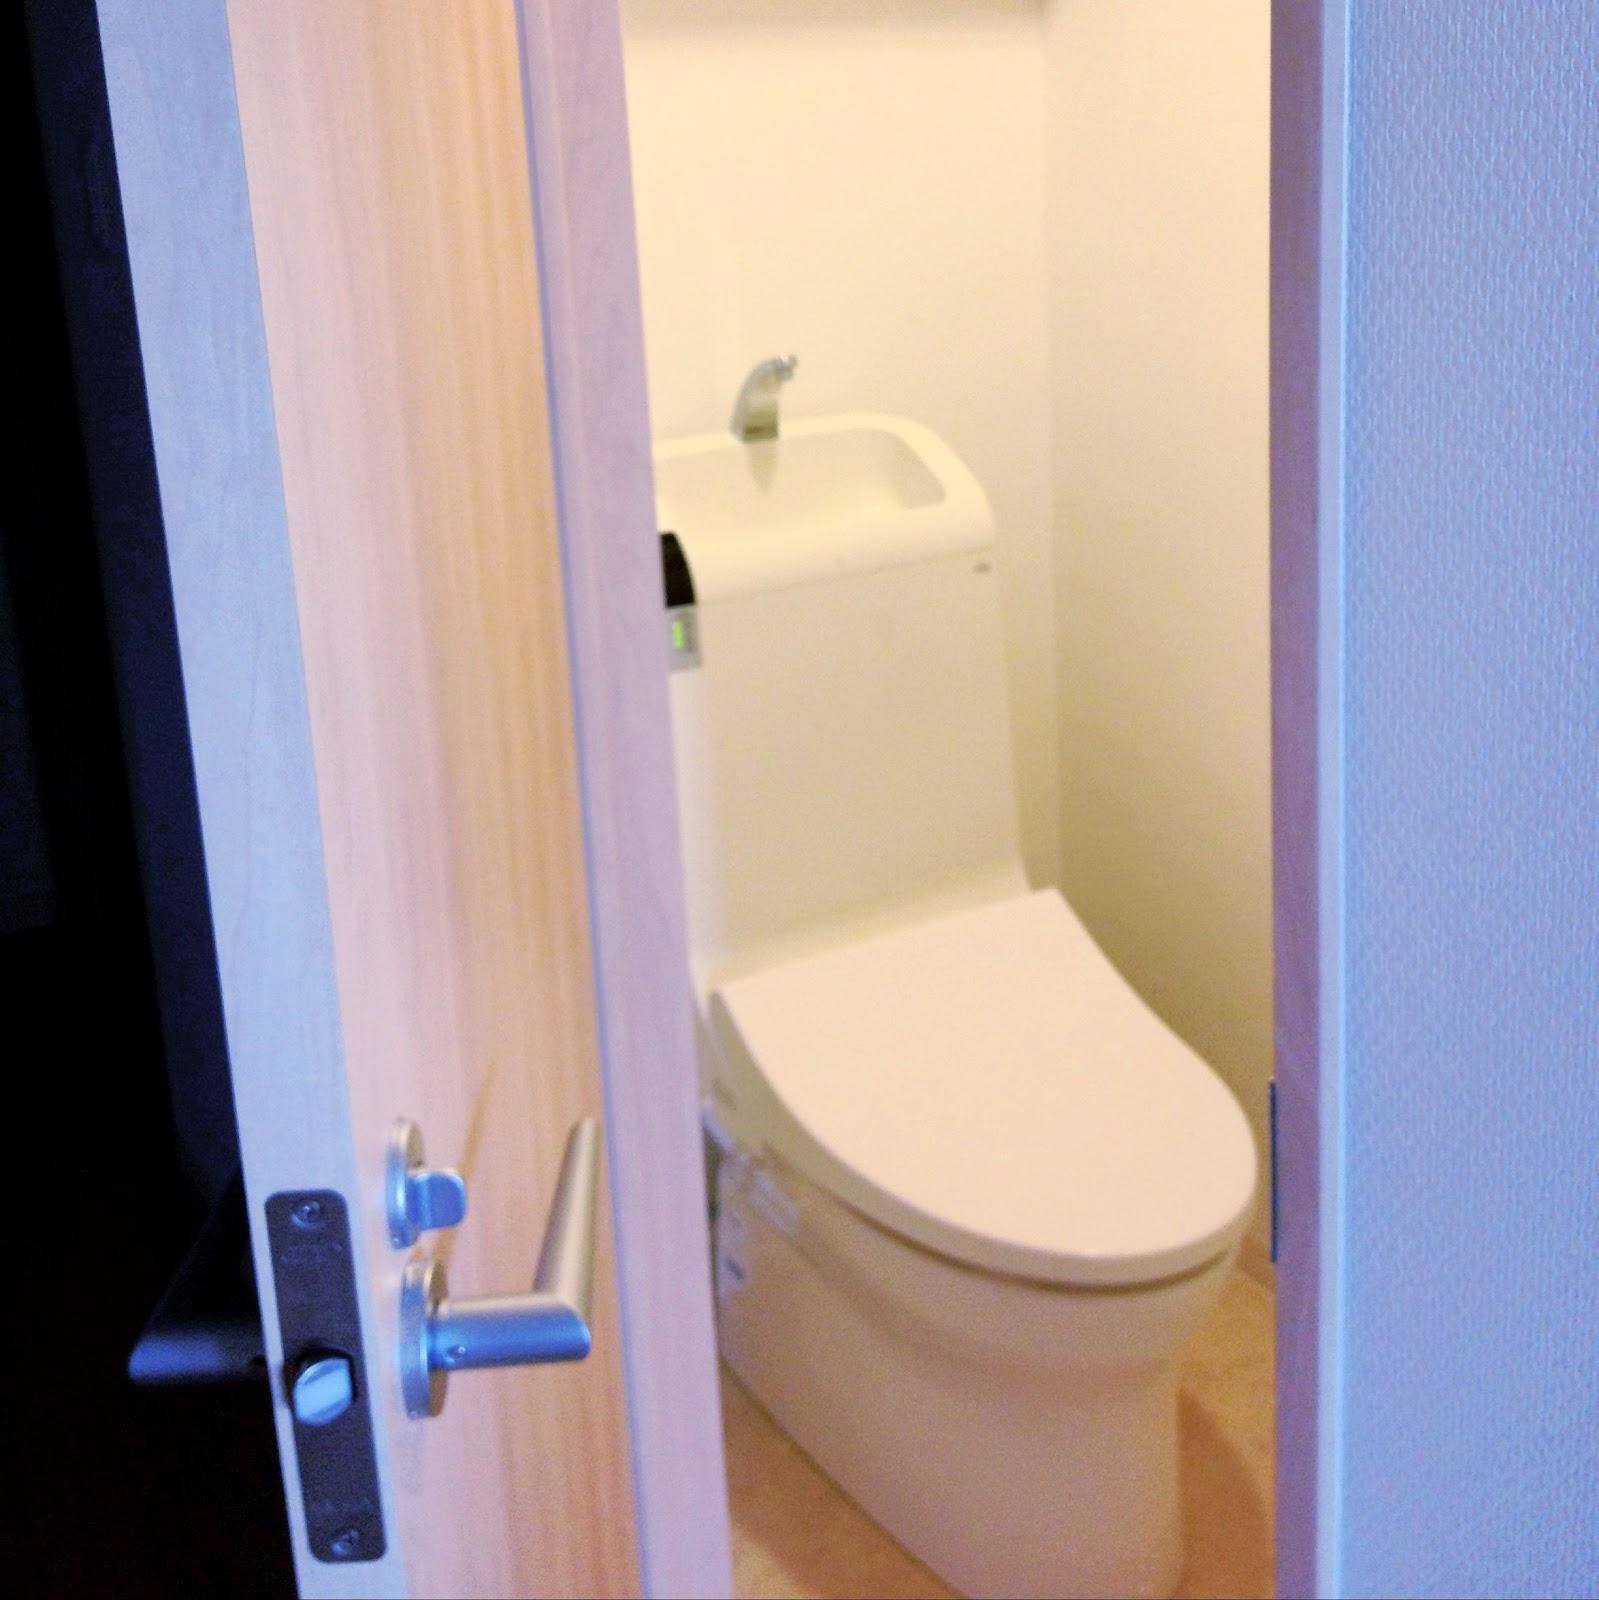 Jackson Riley: a post on Japanese toilets